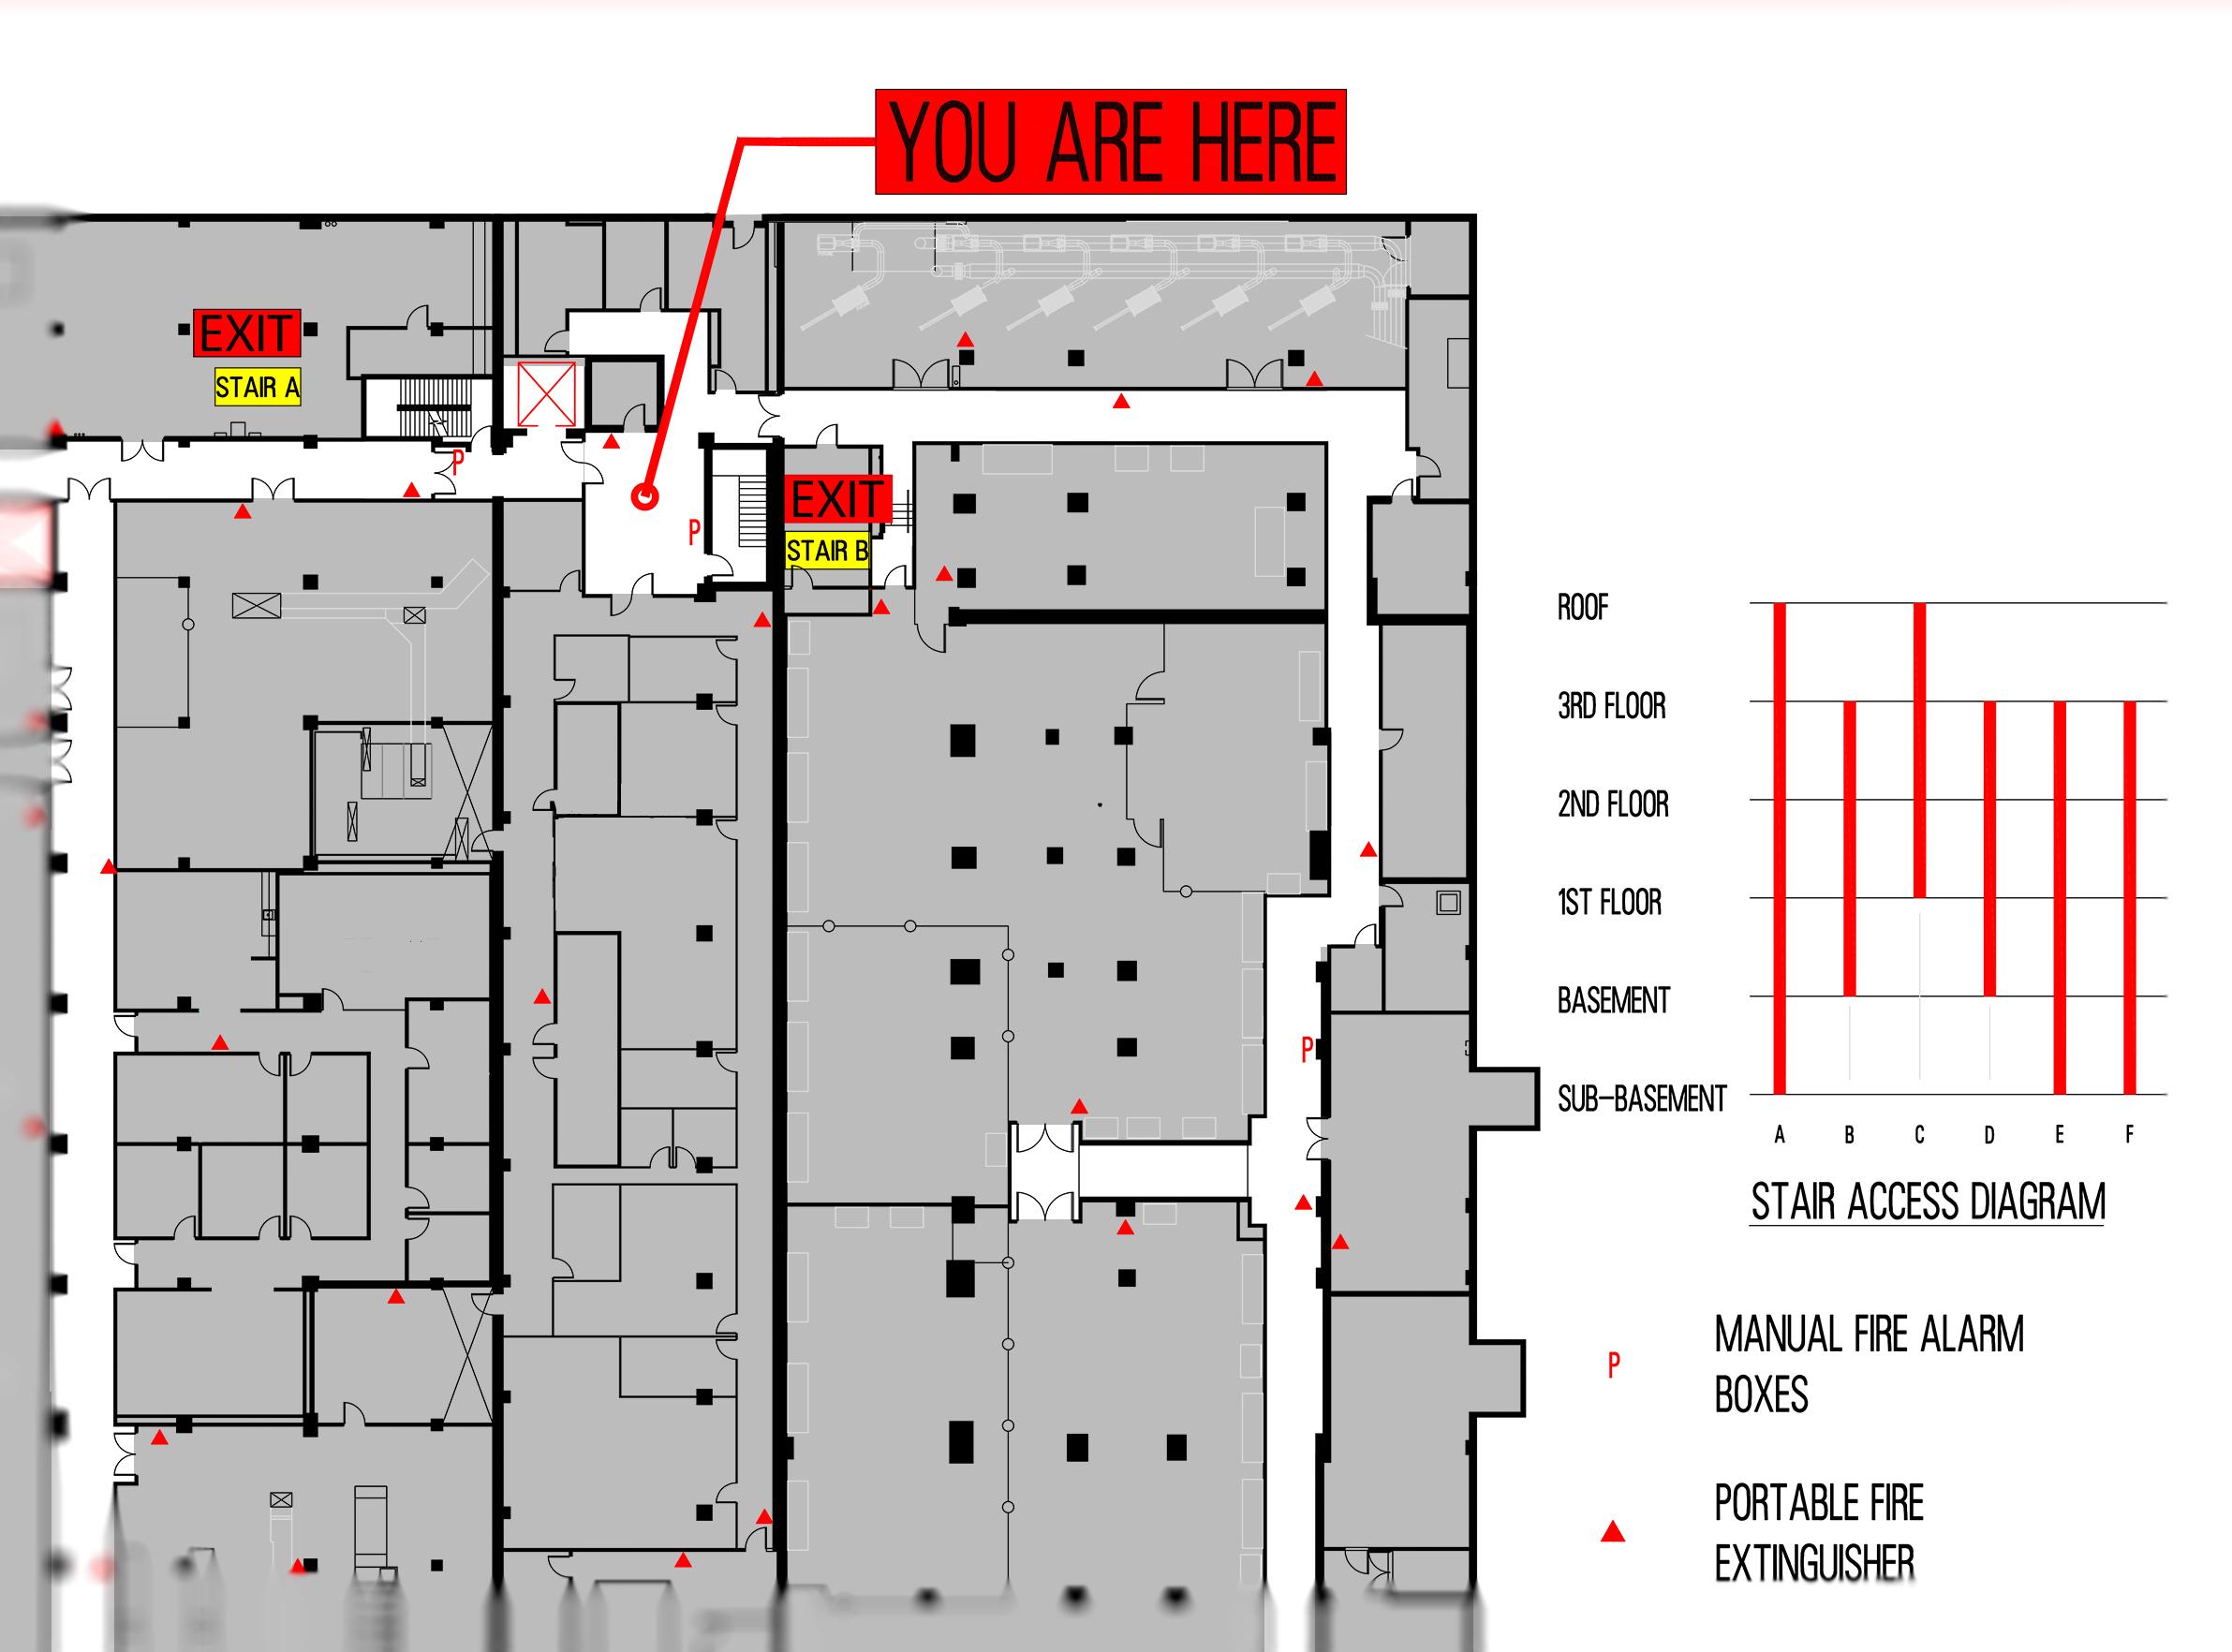 School Exit Plan Diagram - Trusted Wiring Diagram •